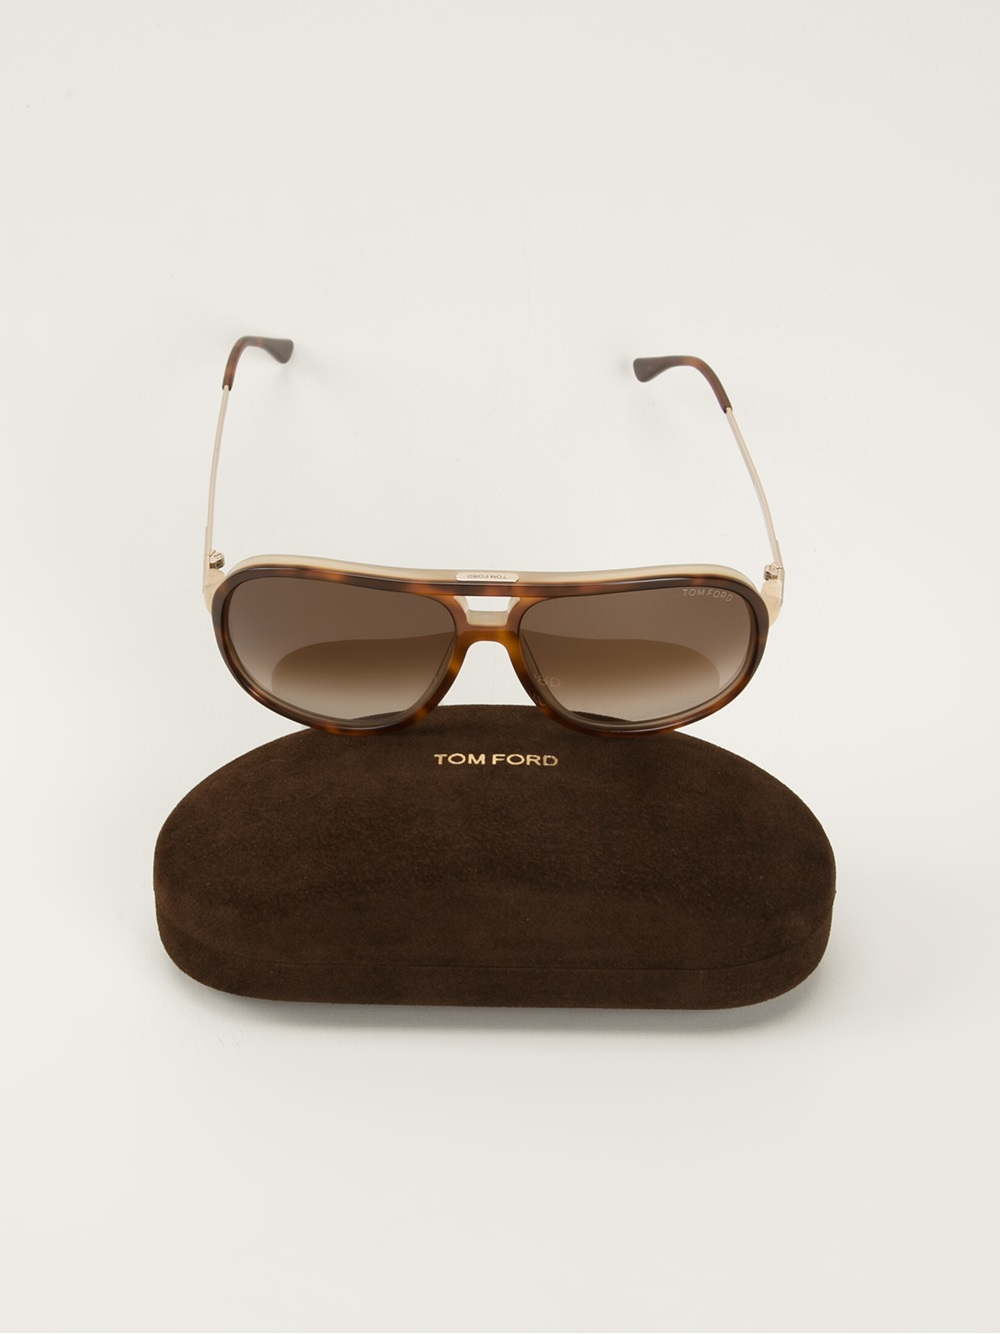 2b5957dc769 Tom Ford Mens Sunglasses Brown